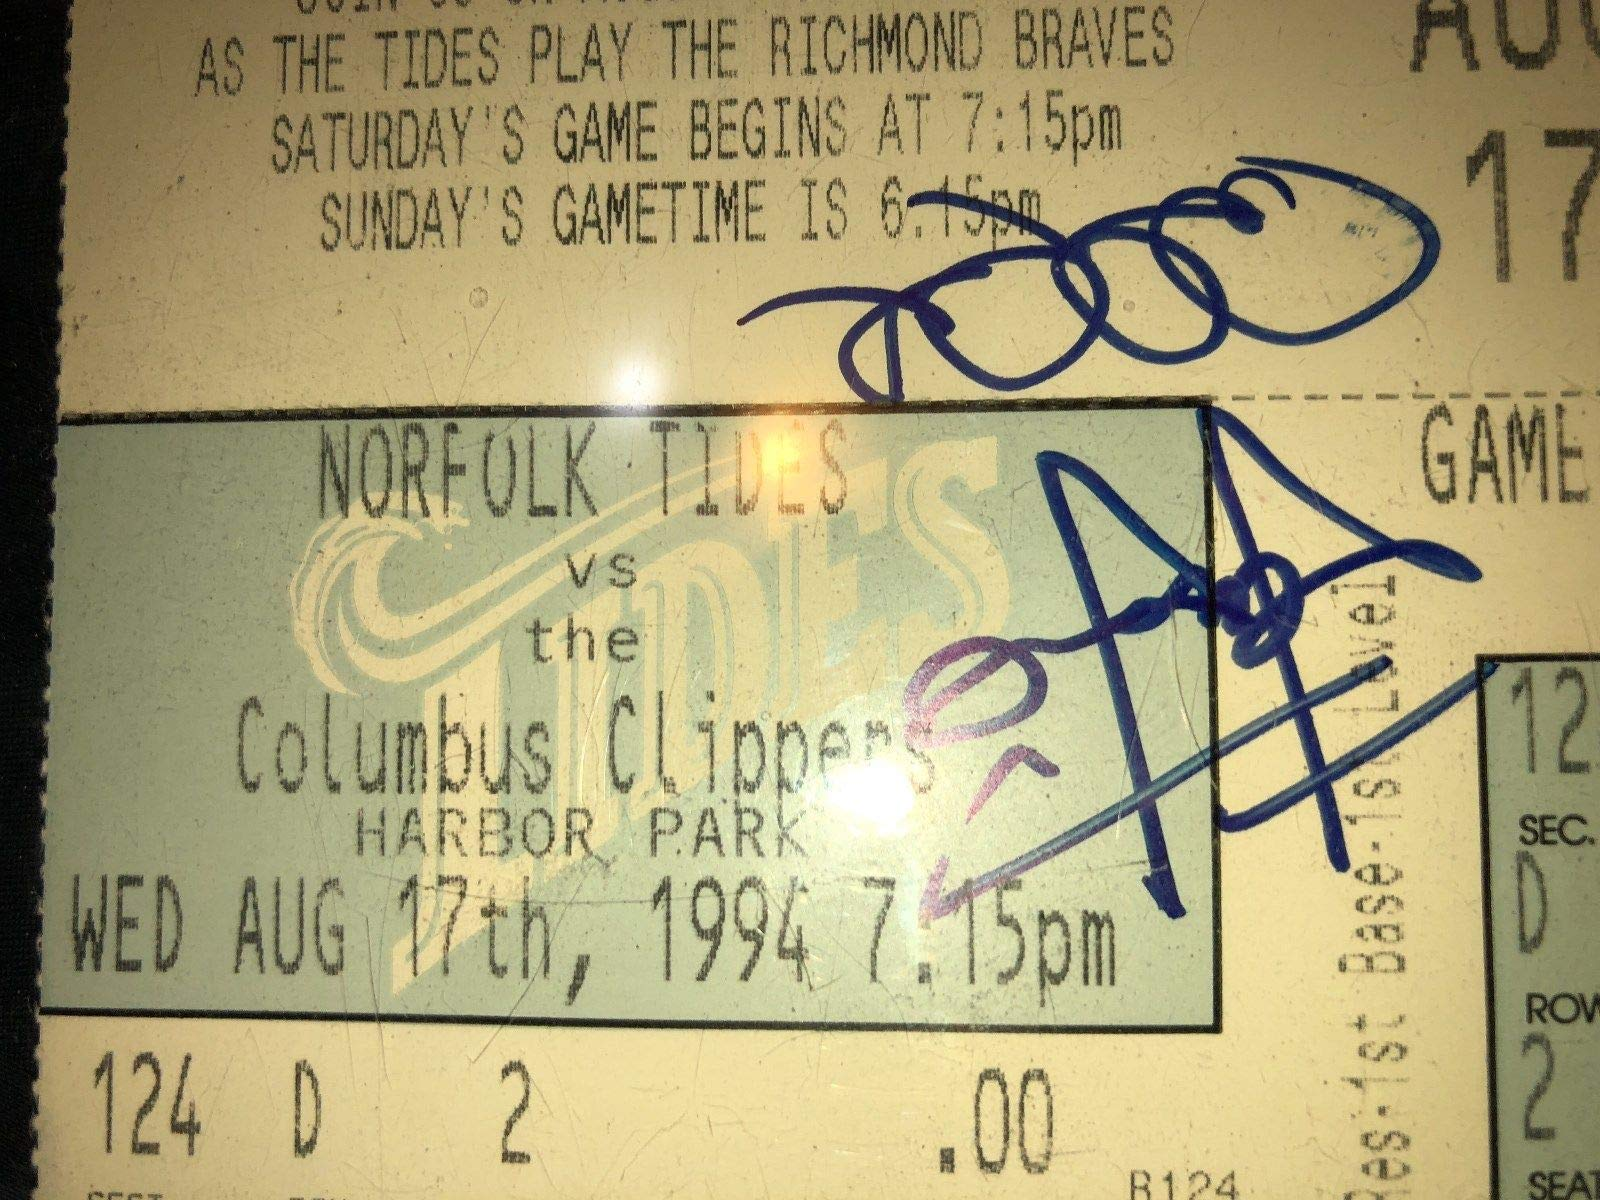 Derek Jeter Rare Autographed Signed Autograph 1994 Minor League Ticket Stub Sports Memorabilia PSA